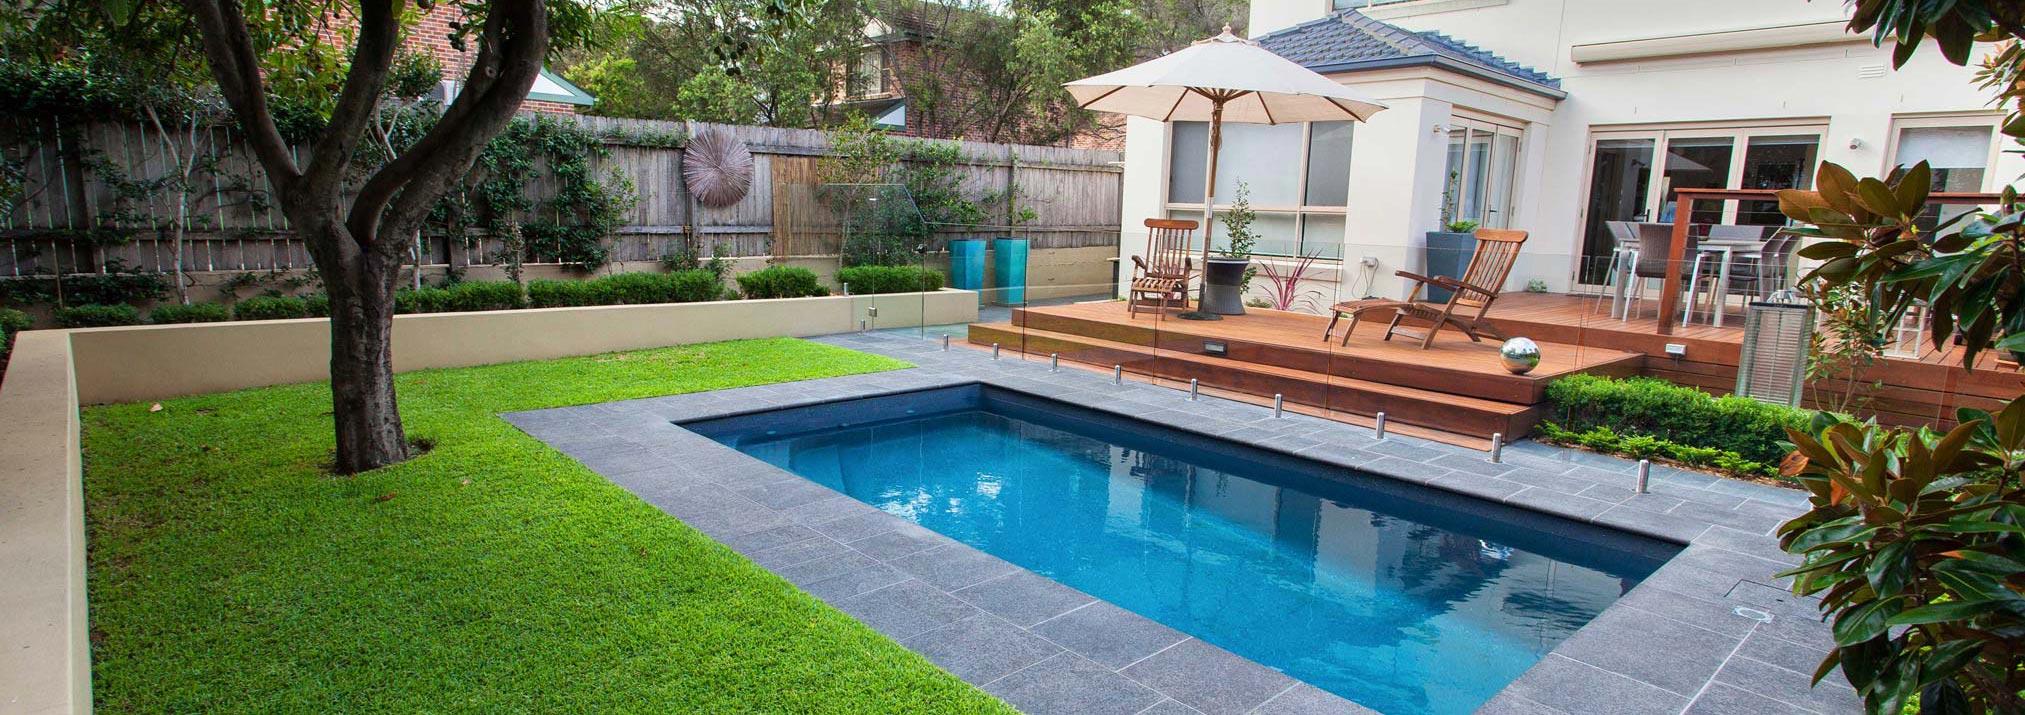 sovereign fibreglass swimming pool